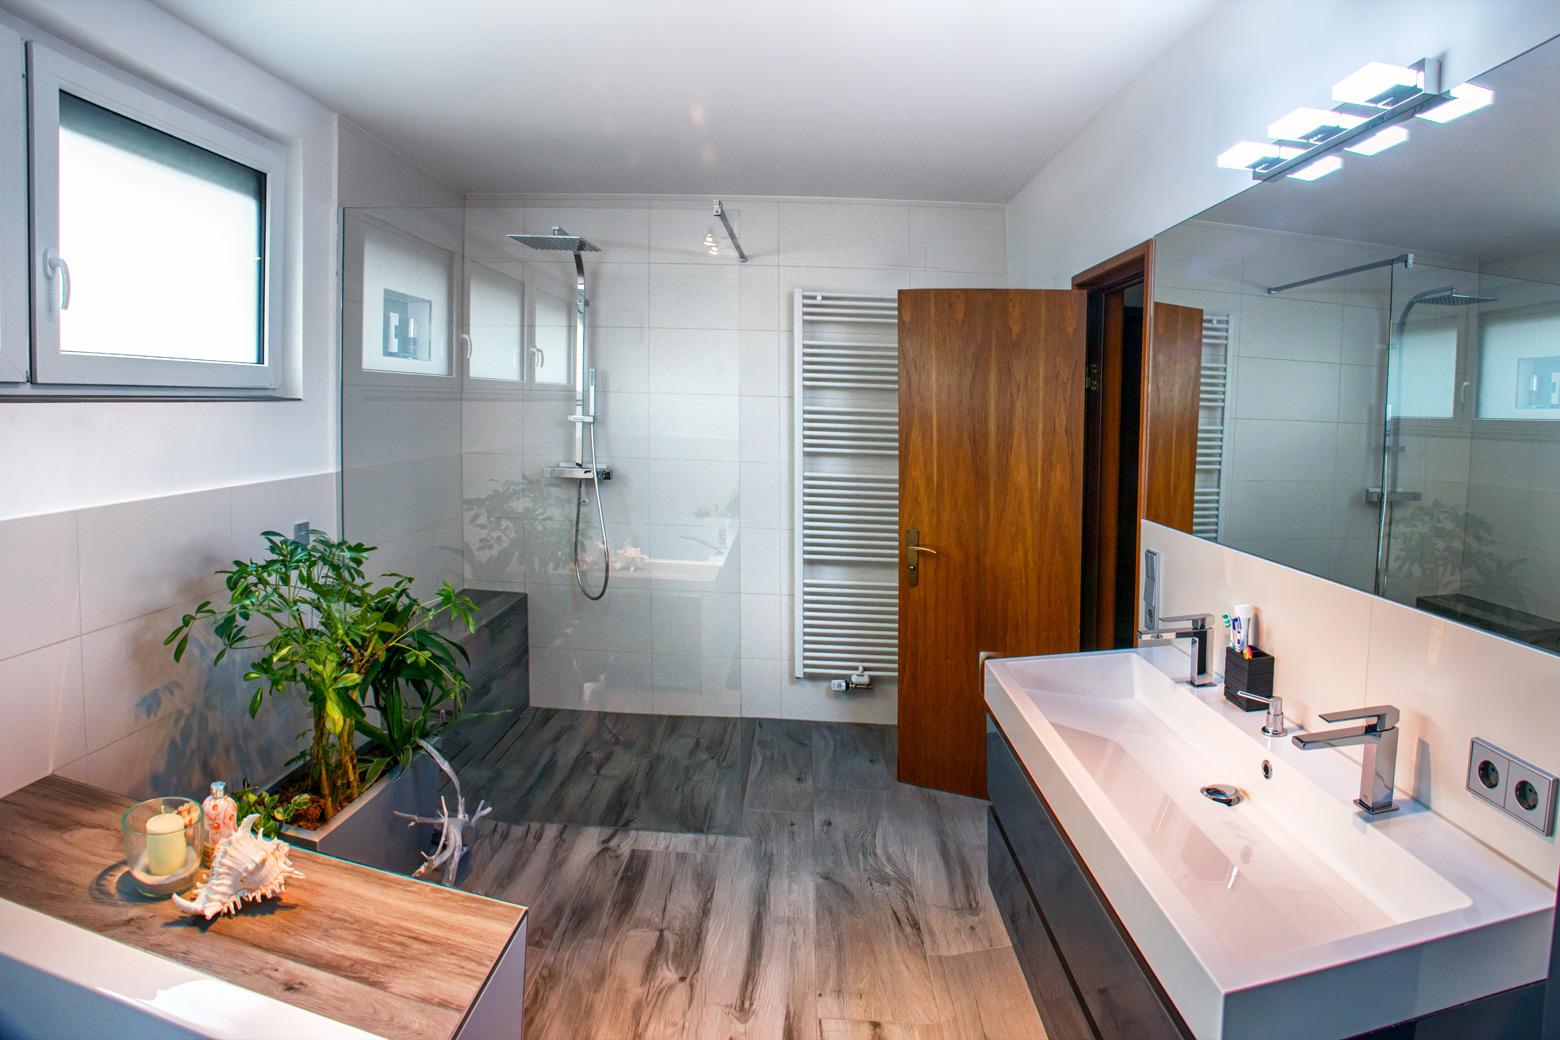 Referenzen kategorie badezimmer 1 donnbronn - Fliesen untergruppenbach ...